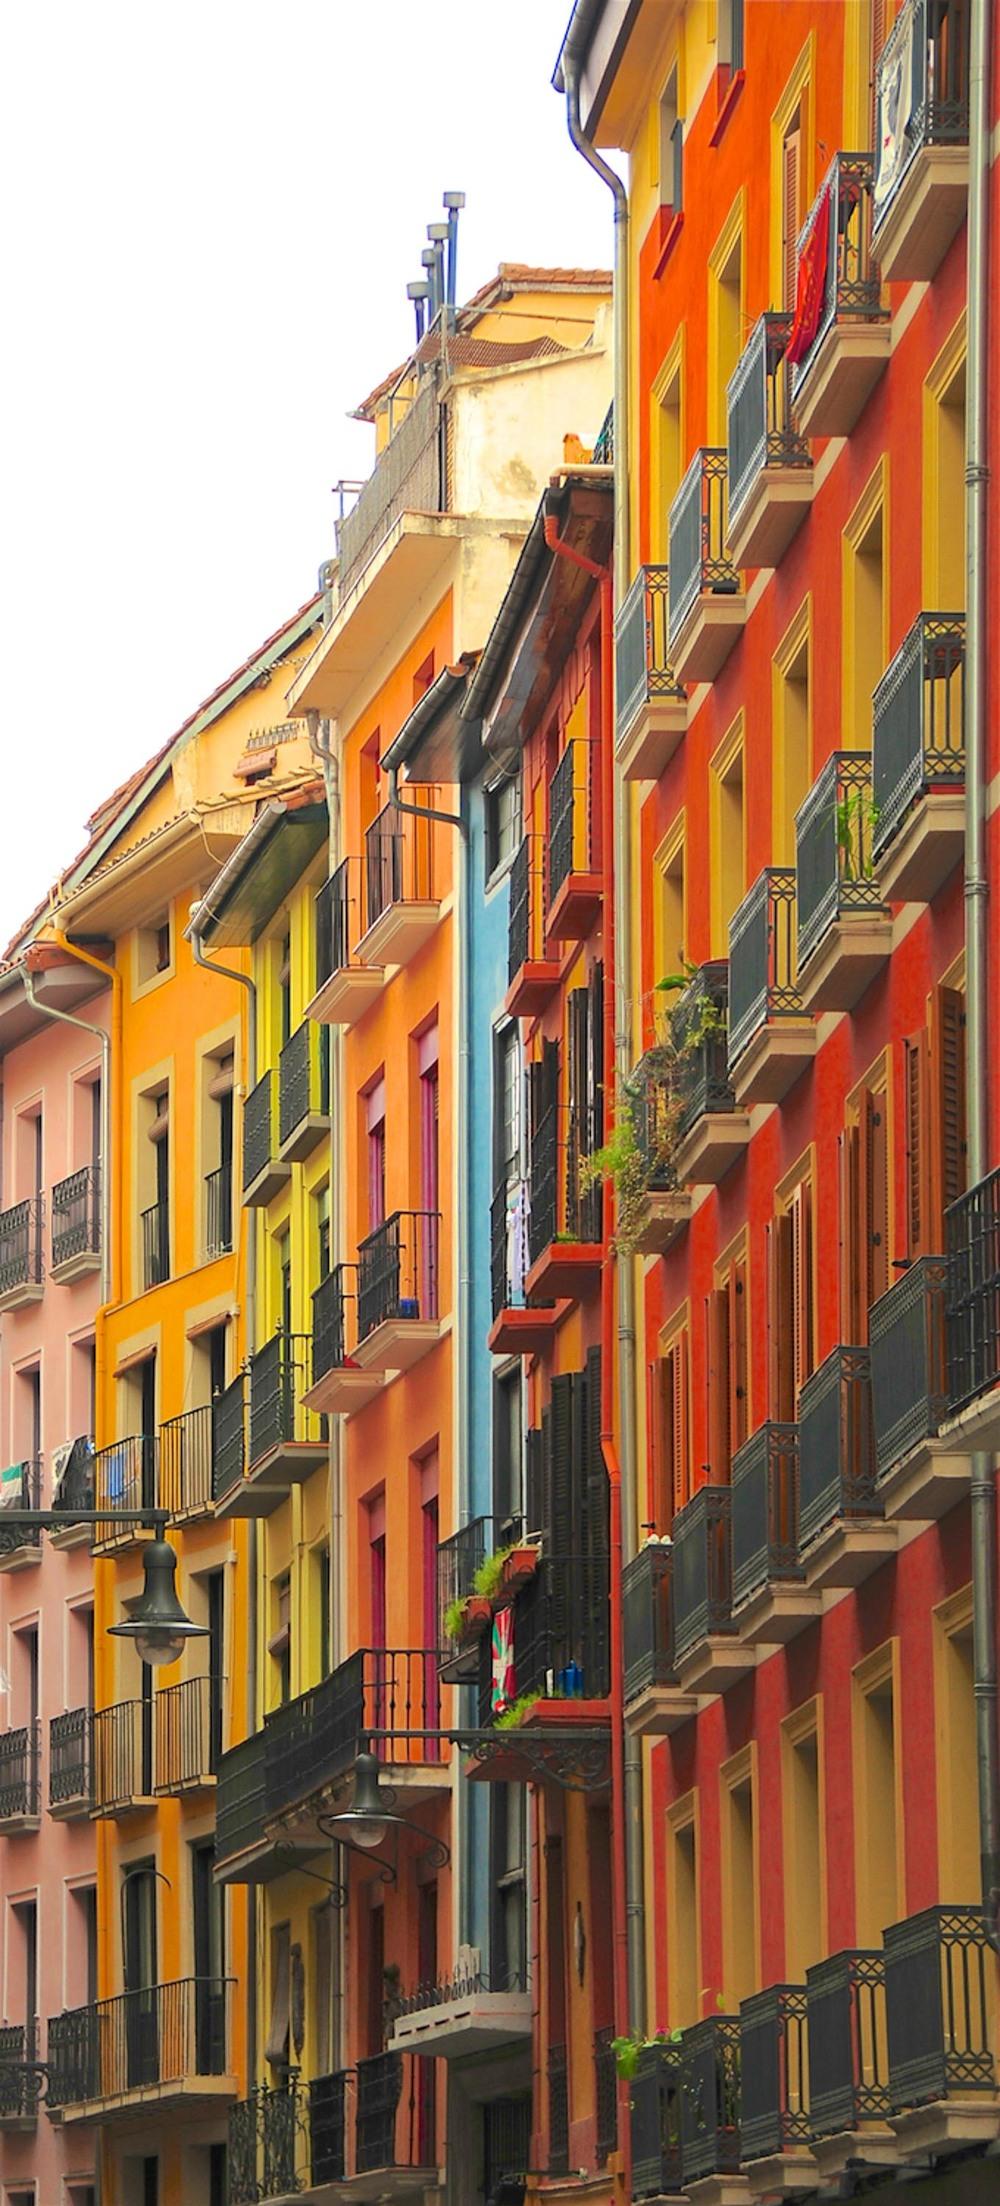 Pamplona, Spain.